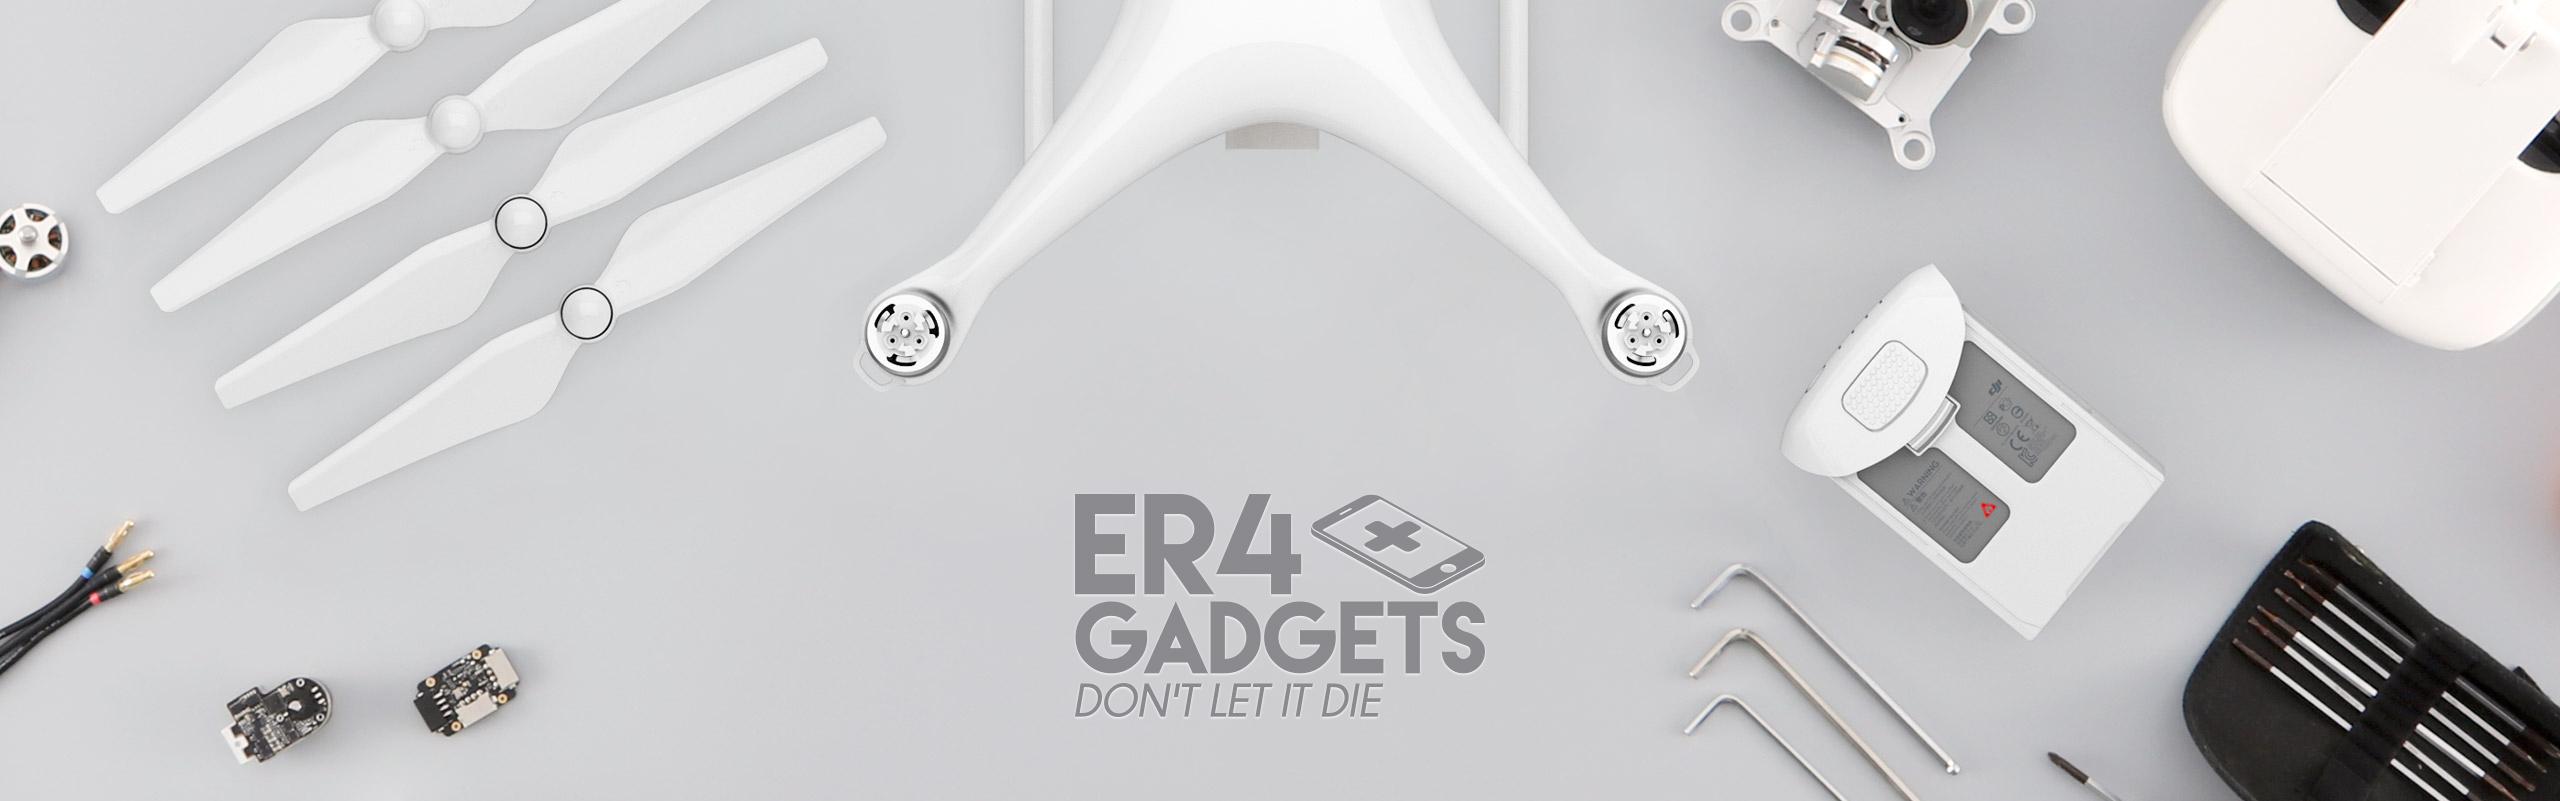 Houston Drone Repair   ER4 Gadgets